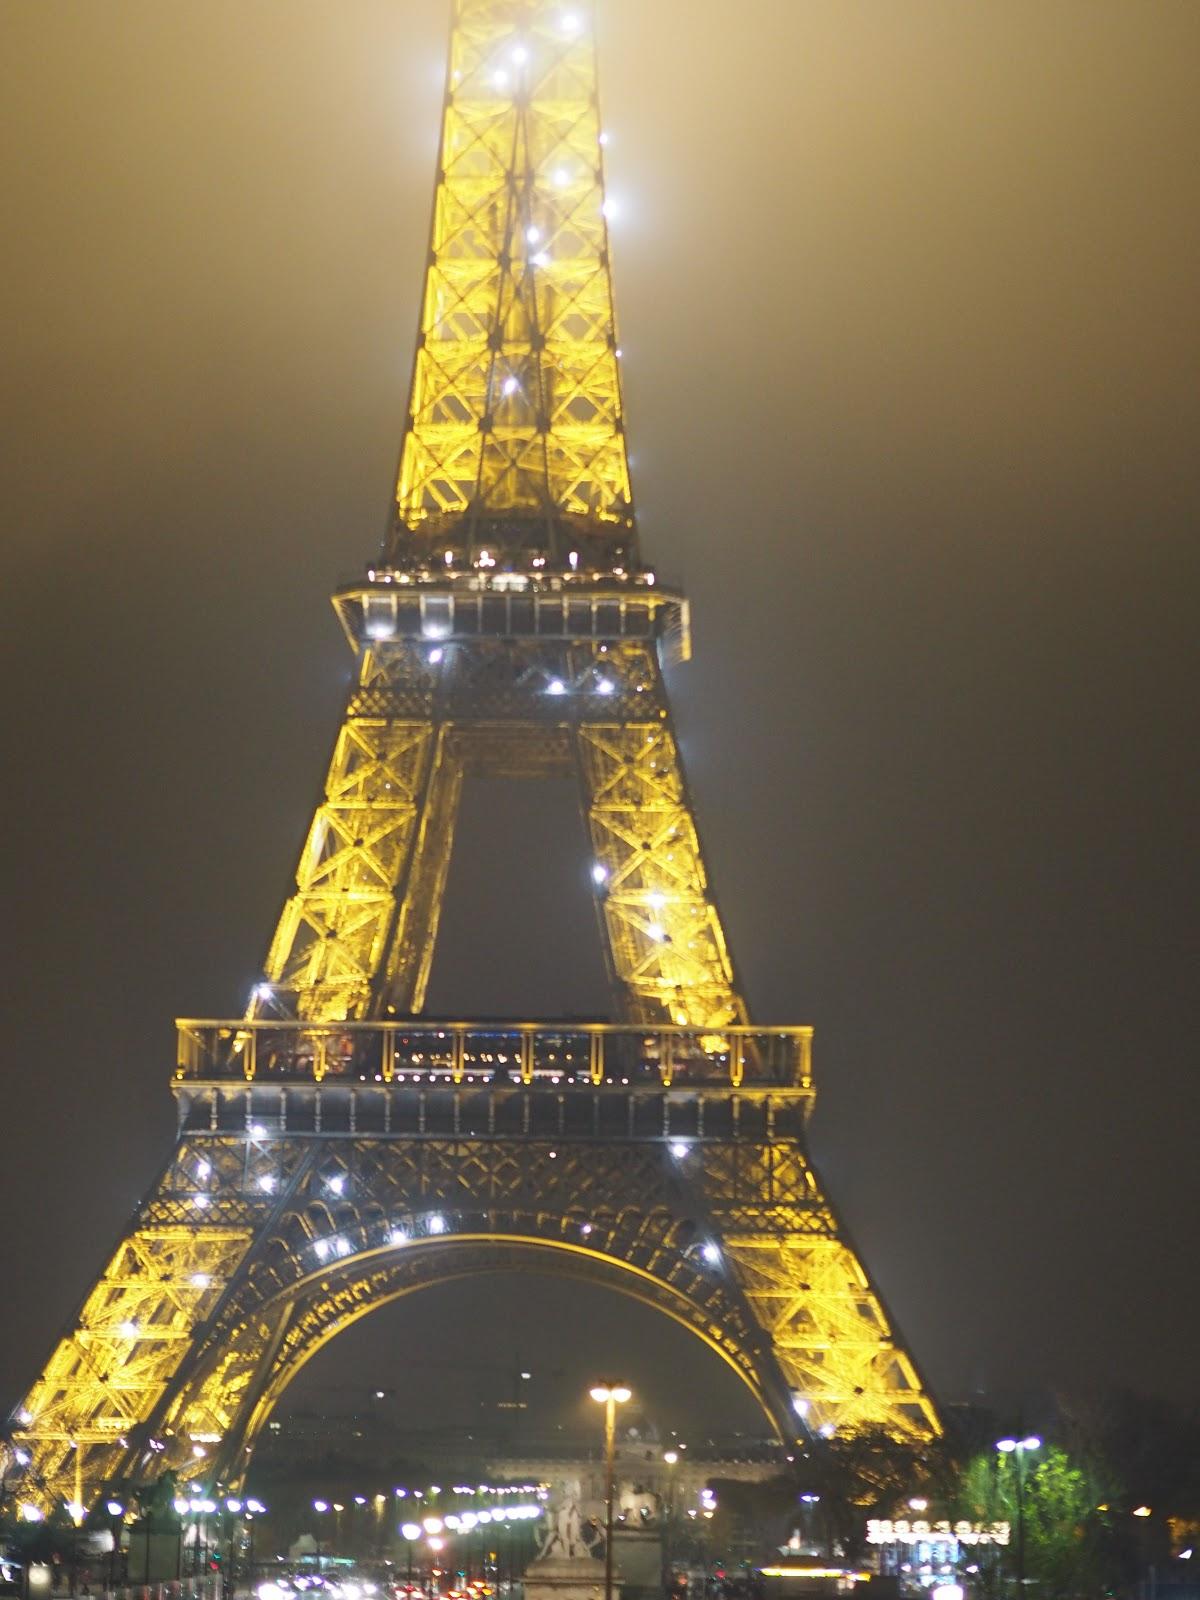 Eiffel Tower, Tour Eiffel, Paris at night time